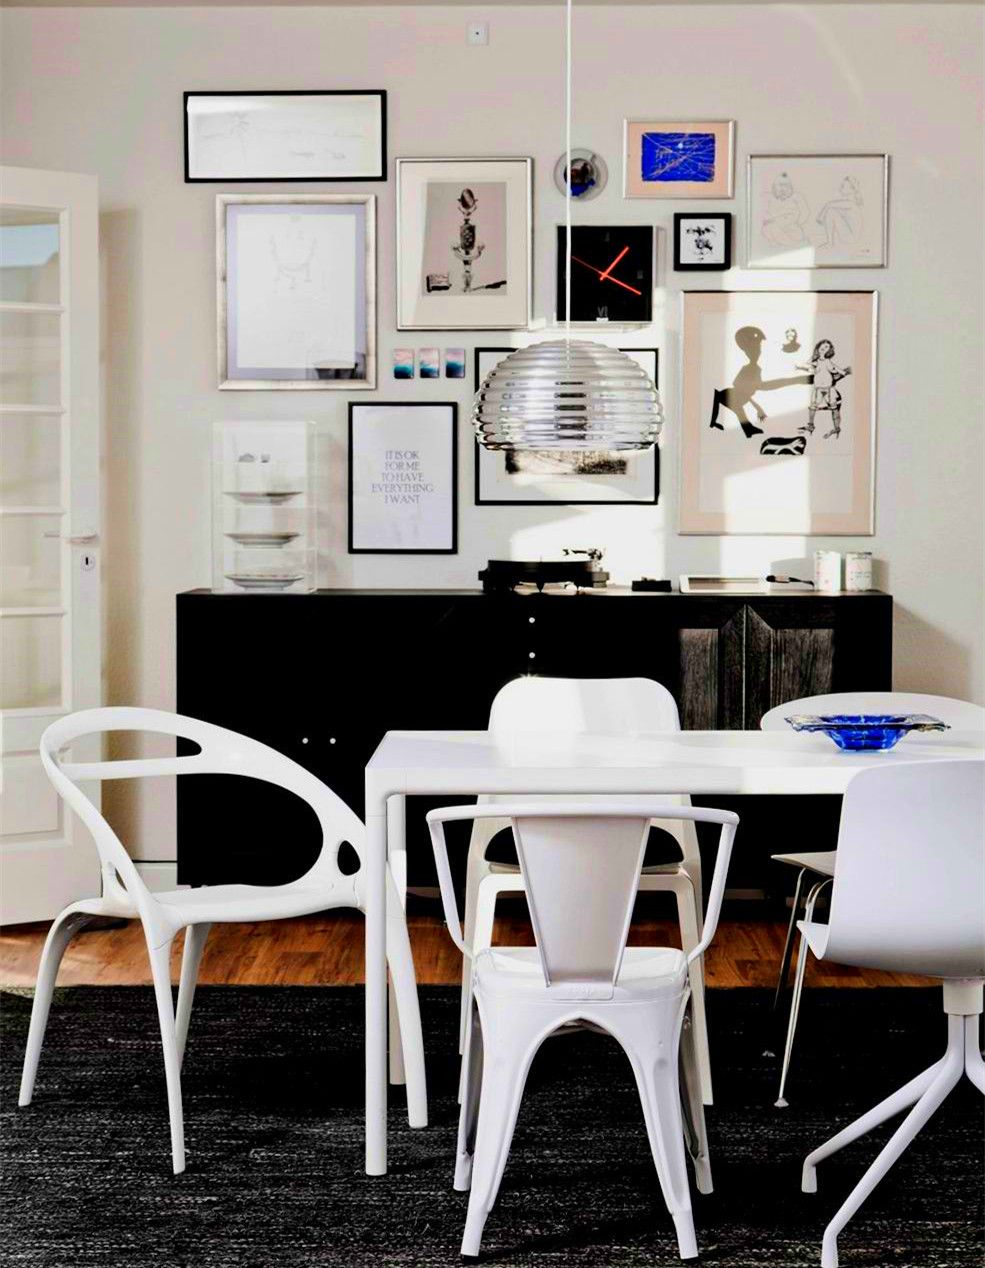 Творческий полусферный кулон https://cheerhuzz.com/collections/pendant-lights/products/splugen-brau-pendant-for-flos-lighting-pl382?variant=11885379396&utm_content=bufferf1085&utm_medium=social&utm_source=pinterest.com&utm_campaign=buffer #architecture #homedecor #design #lighting #home #villa #interior #create #life